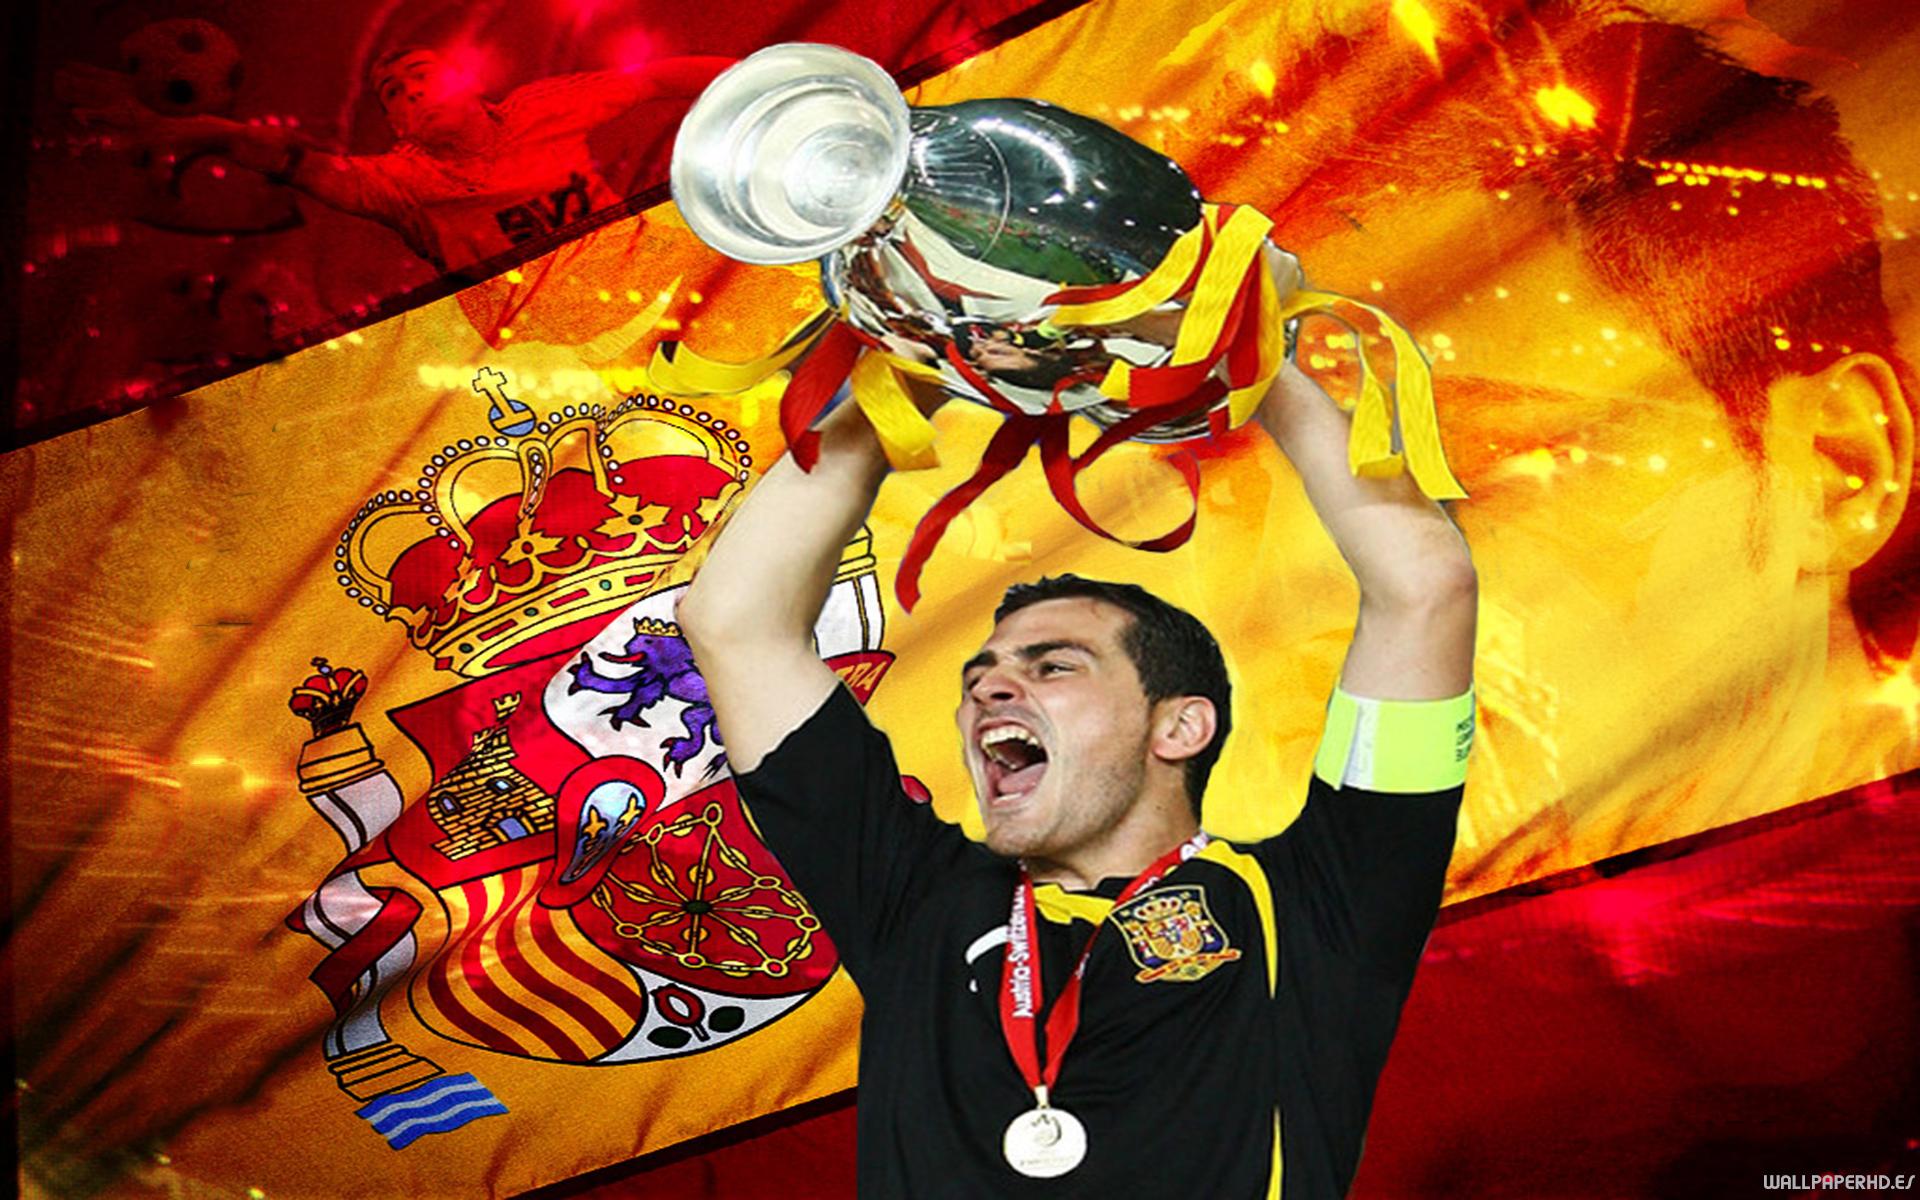 Fondo Espana Hd: Casillas-espana-wallpaperhd